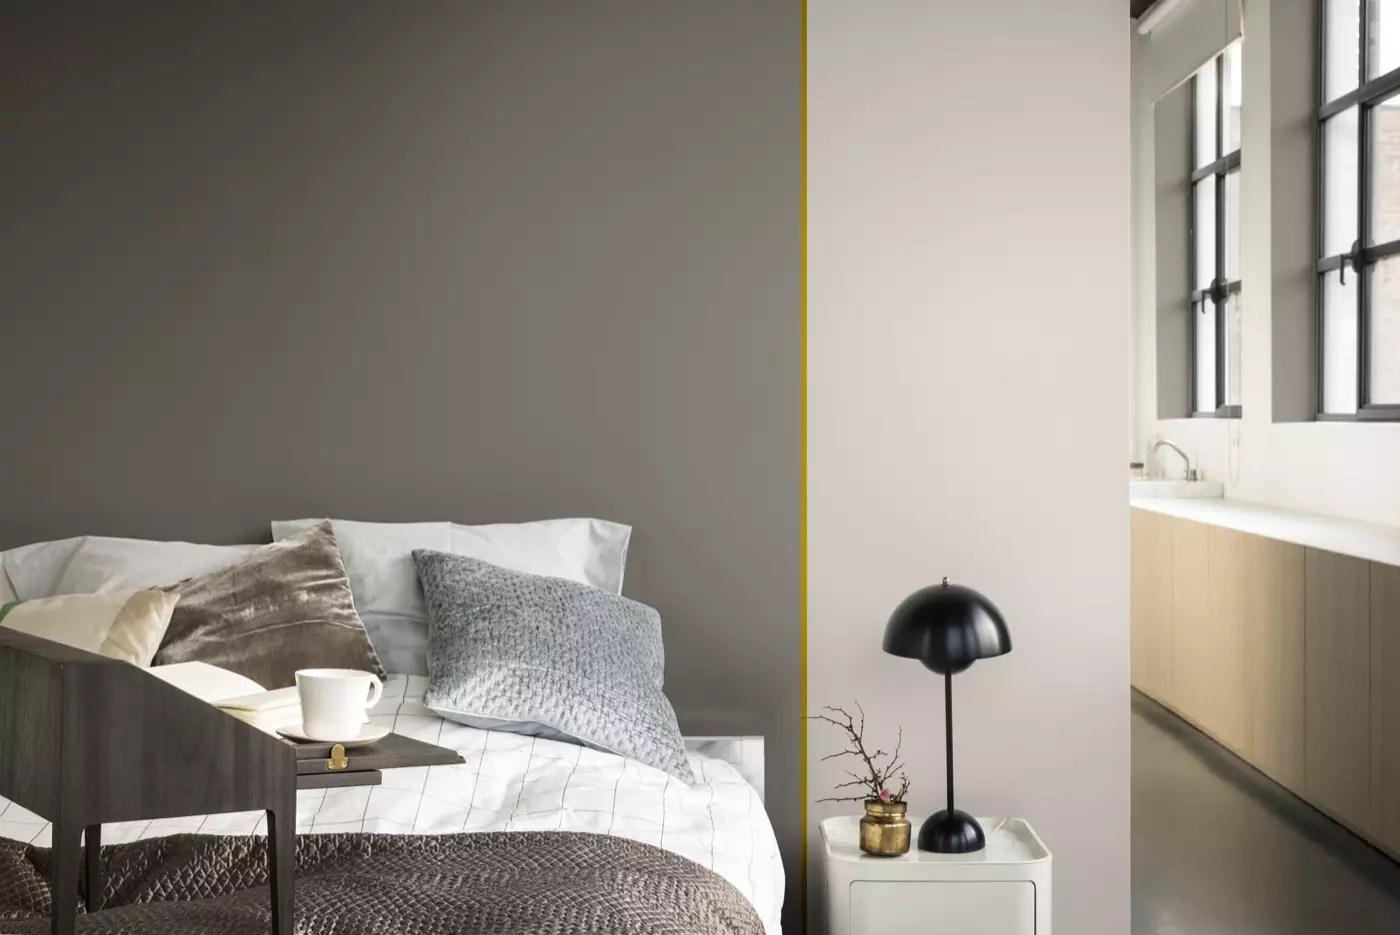 Klein Wonen Kantoor : Thuis kantoor u stijlvol styling woon vol interieur